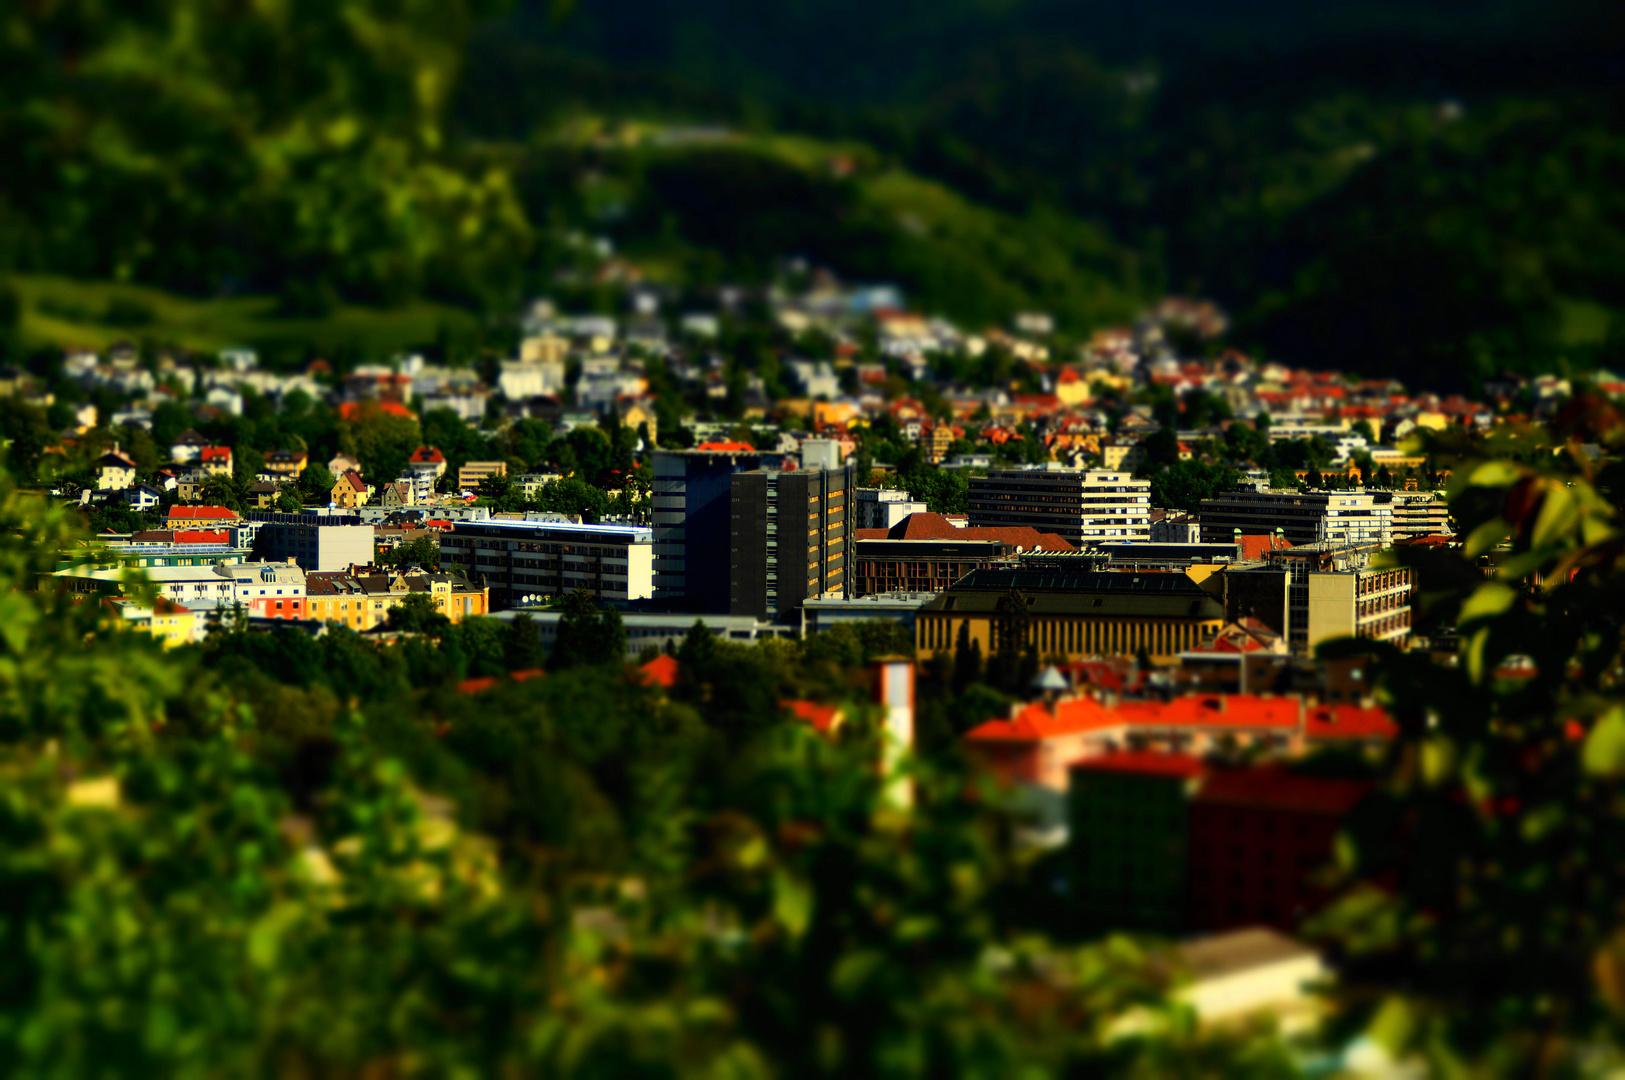 Klinik Areal Innsbruck in Miniatur